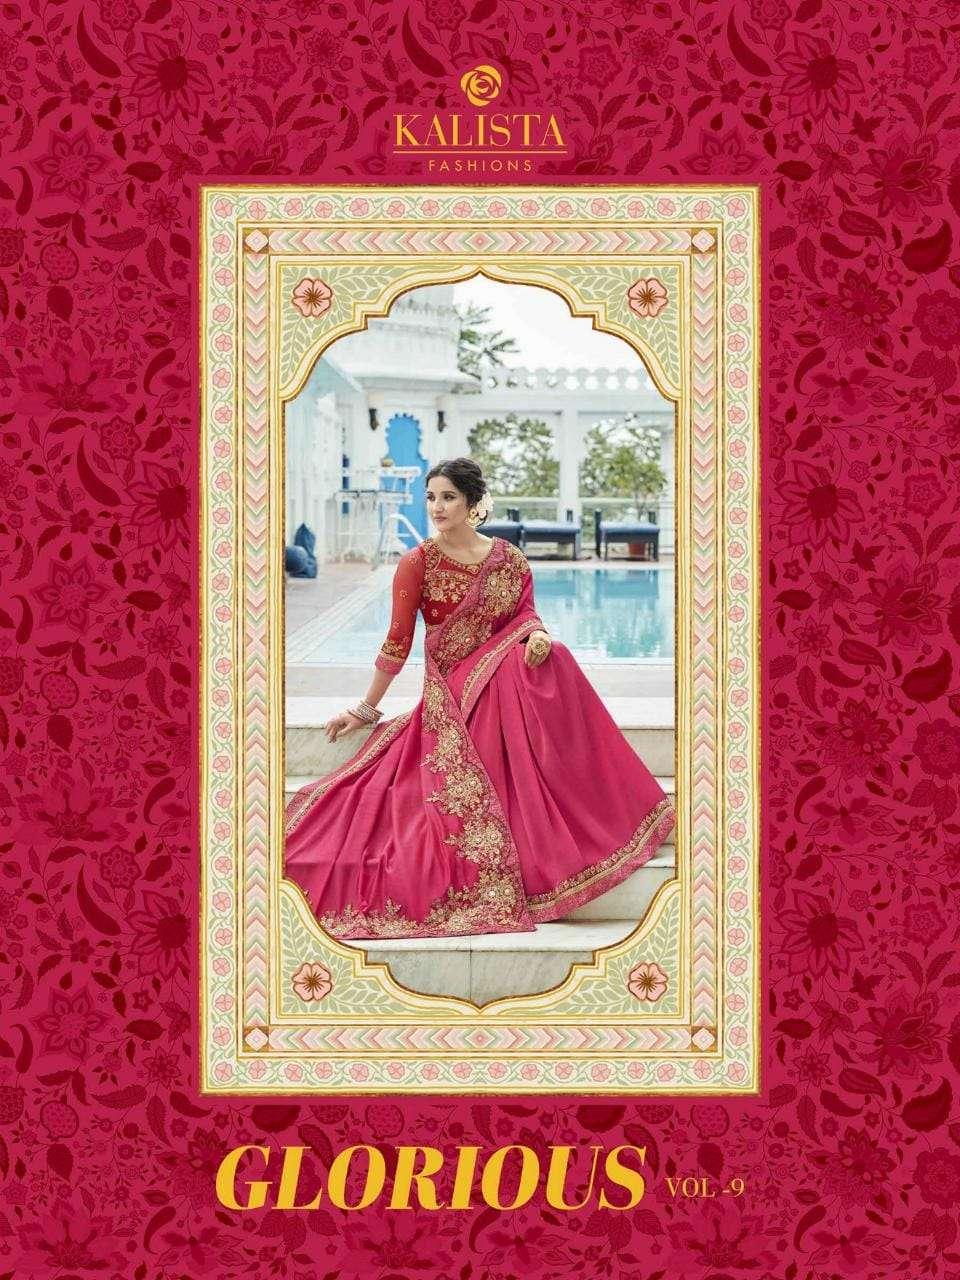 Kalista Glorious Vol 9 Vichitra Designer Fancy Saree